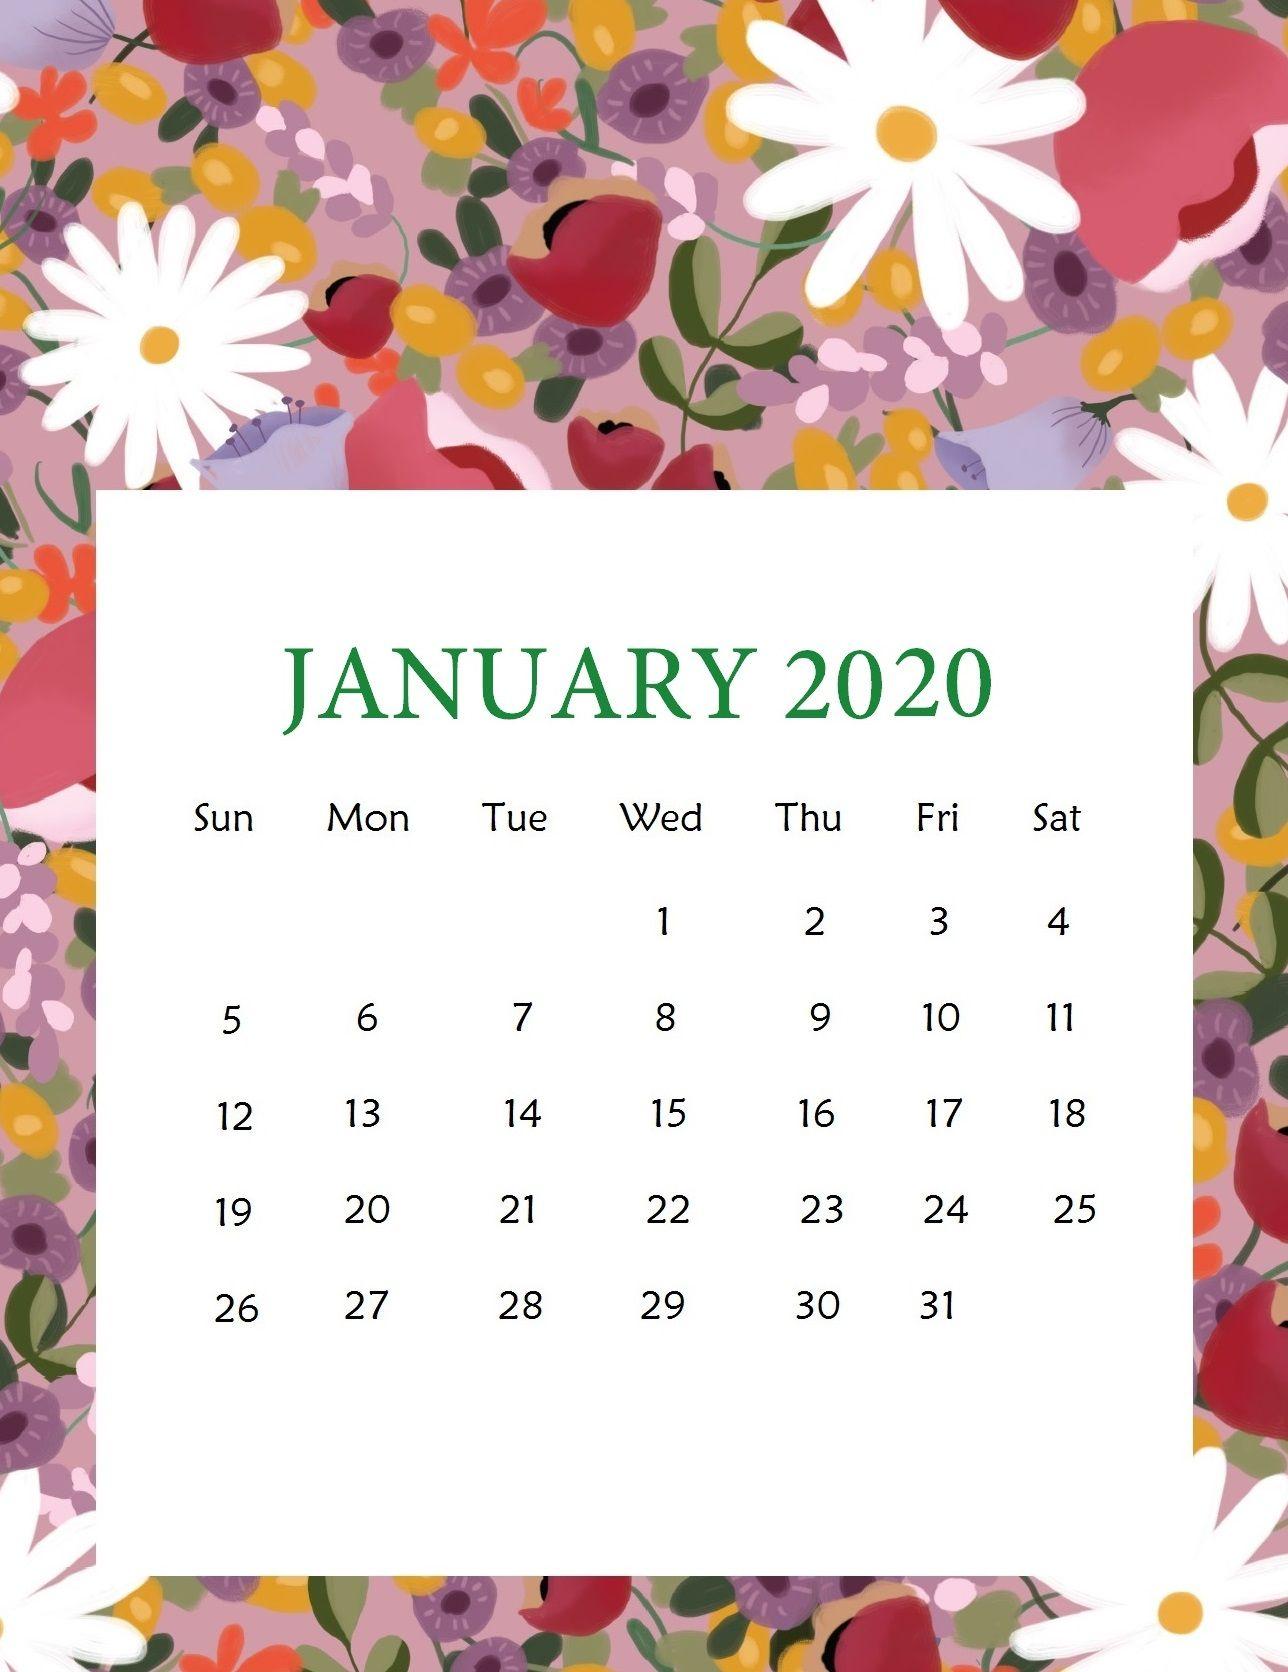 Unique 15 Cute January 2020 Calendar Desk Wallpaper Floral For Desktop Iphone Blank Printa January Calendar Free Printable Calendar Templates Kids Calendar